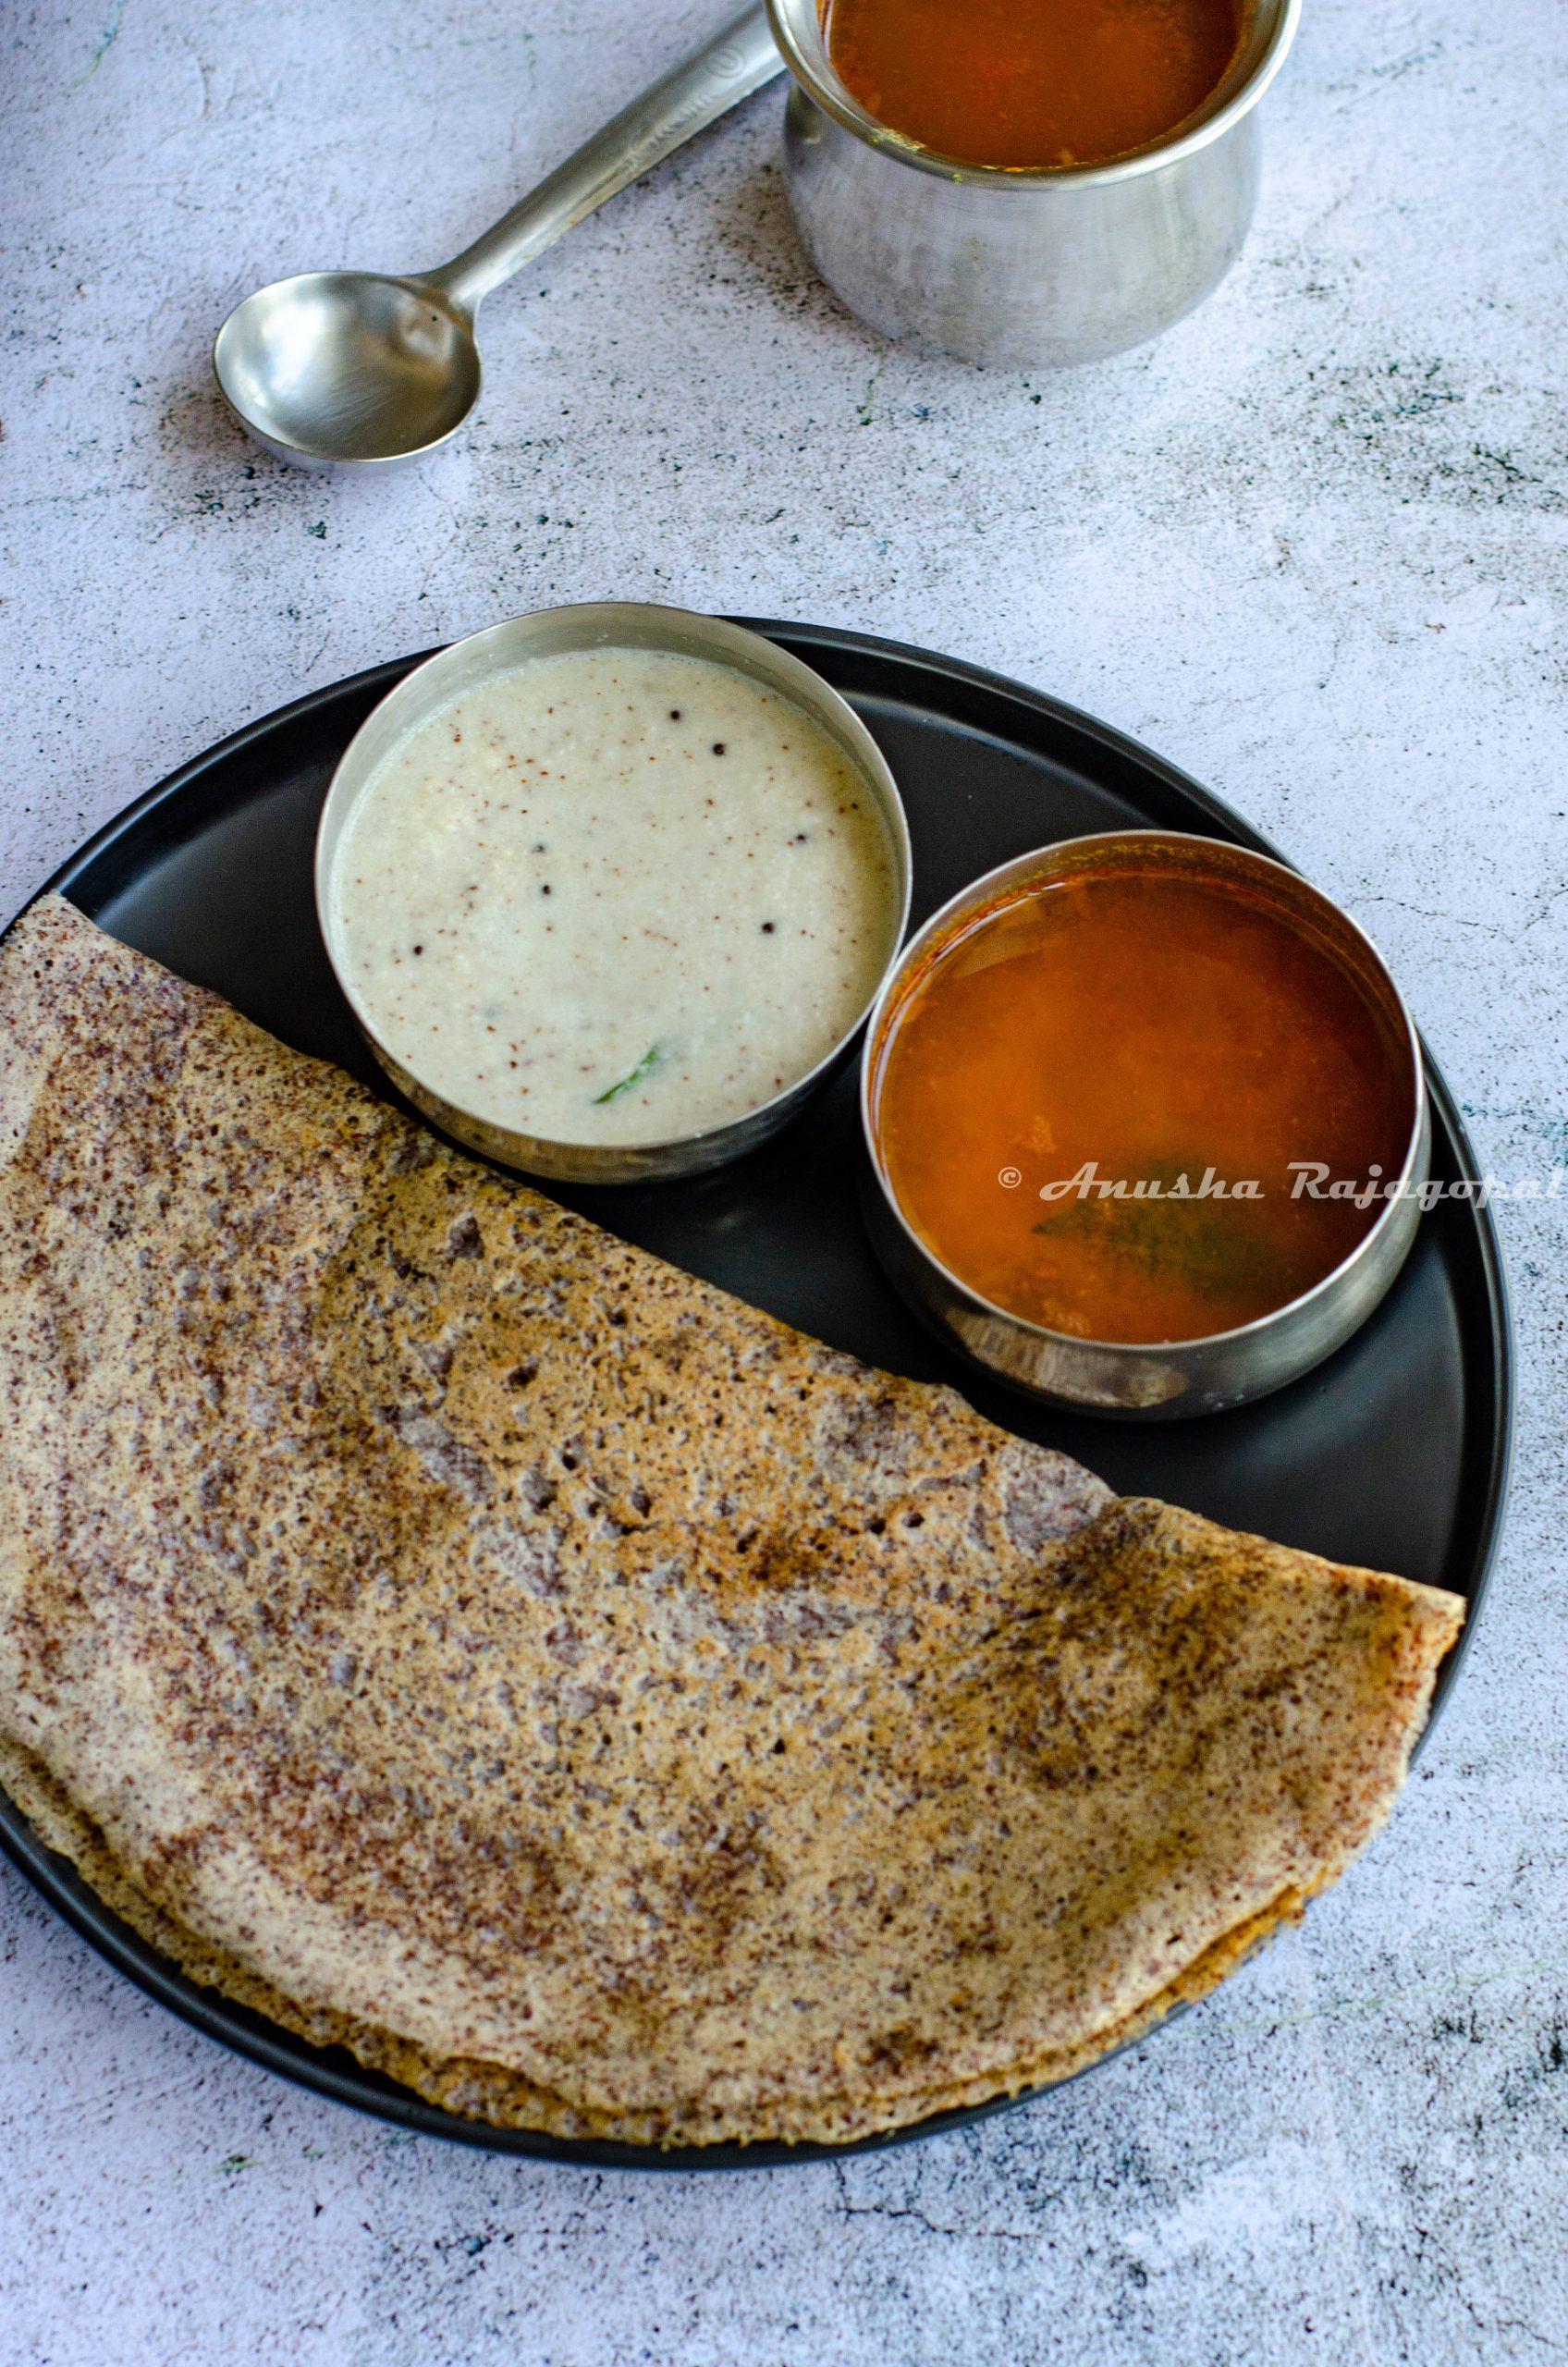 Ragi dosa served with coconut chutney and sambar on a black plate